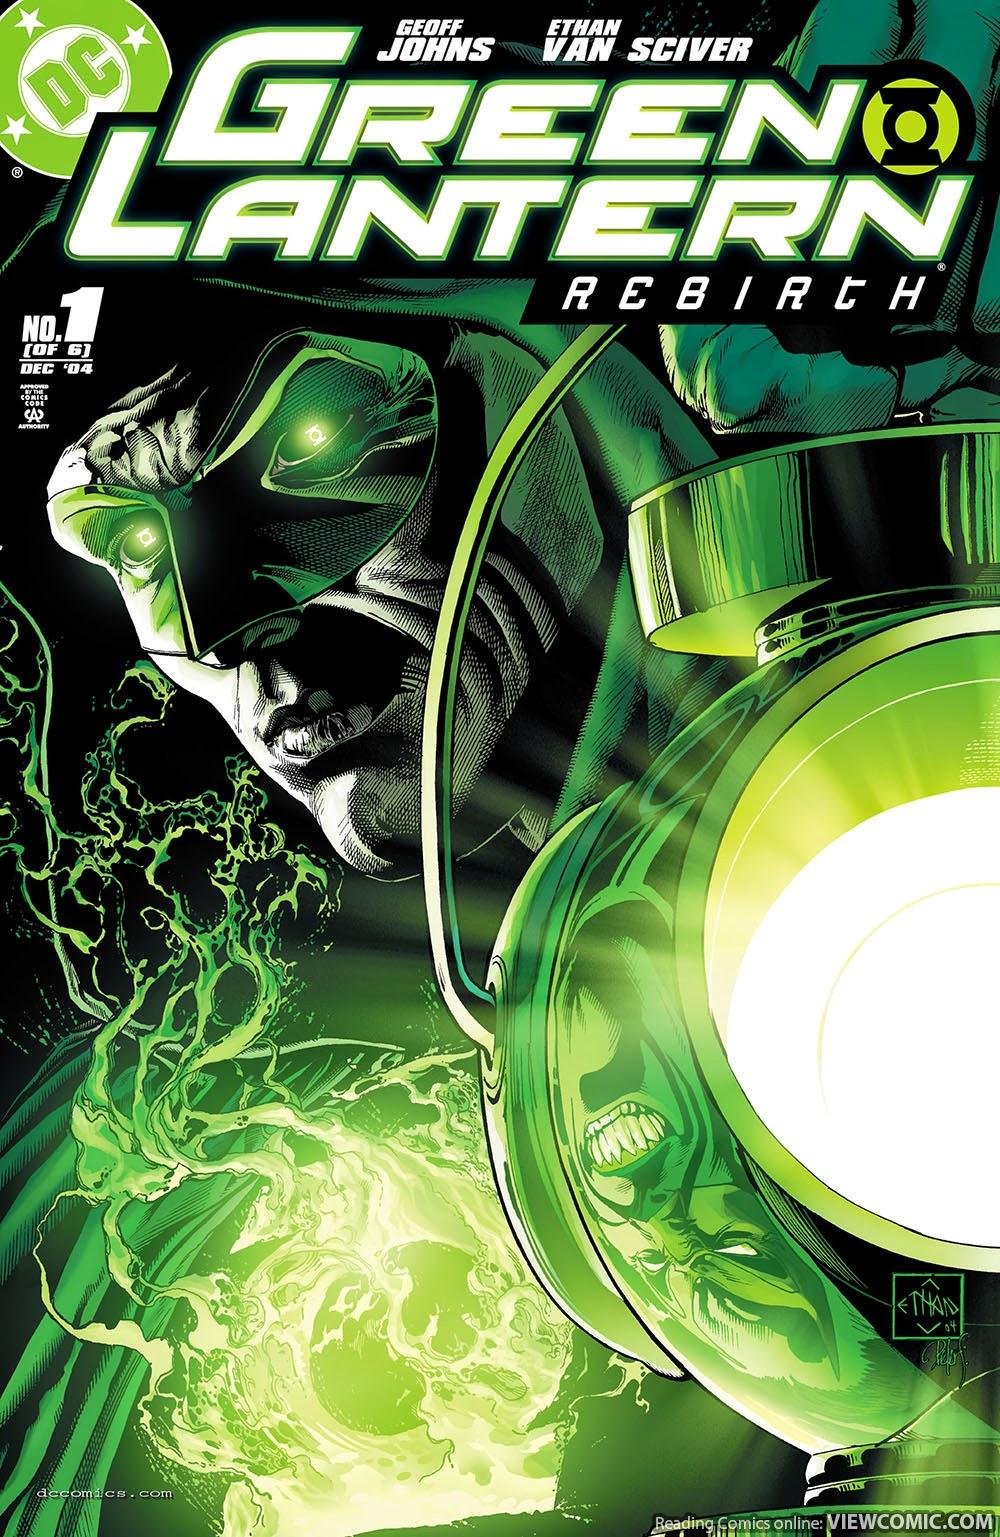 green lantern rebirth 001 2004 vietcomic net reading comics for free